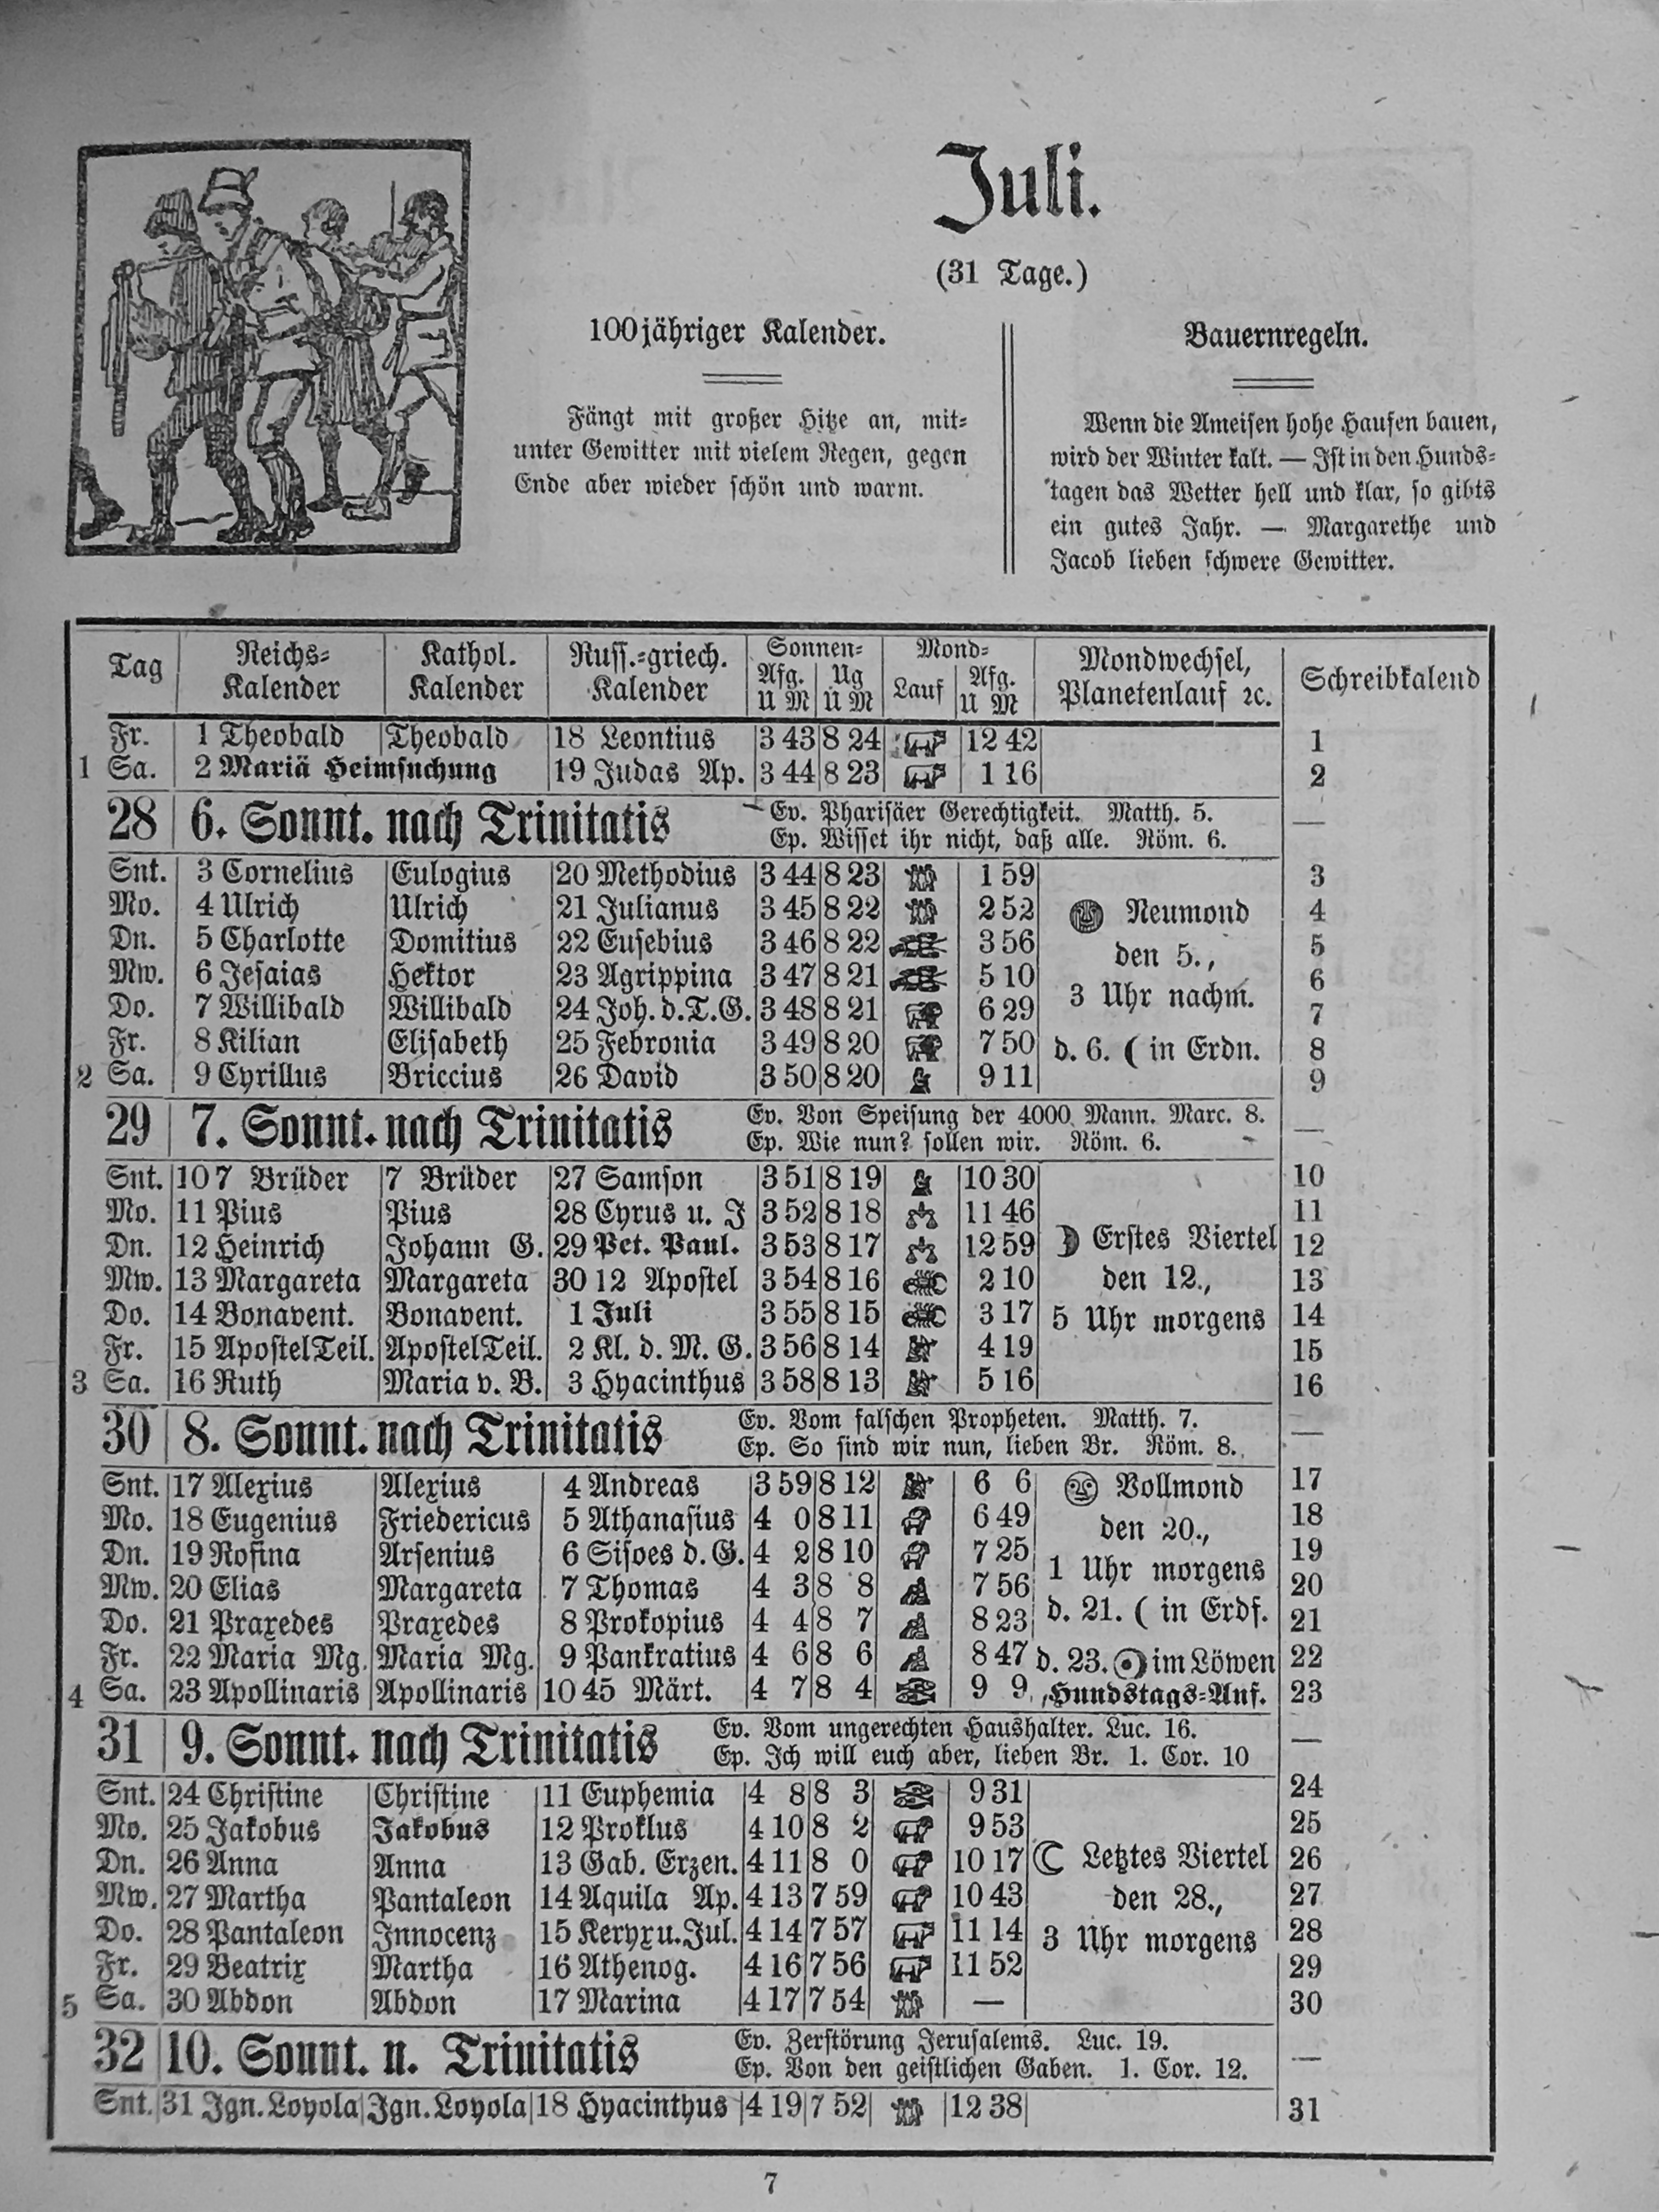 File:Harz-Berg-Kalender 1921 008 png - Wikimedia Commons